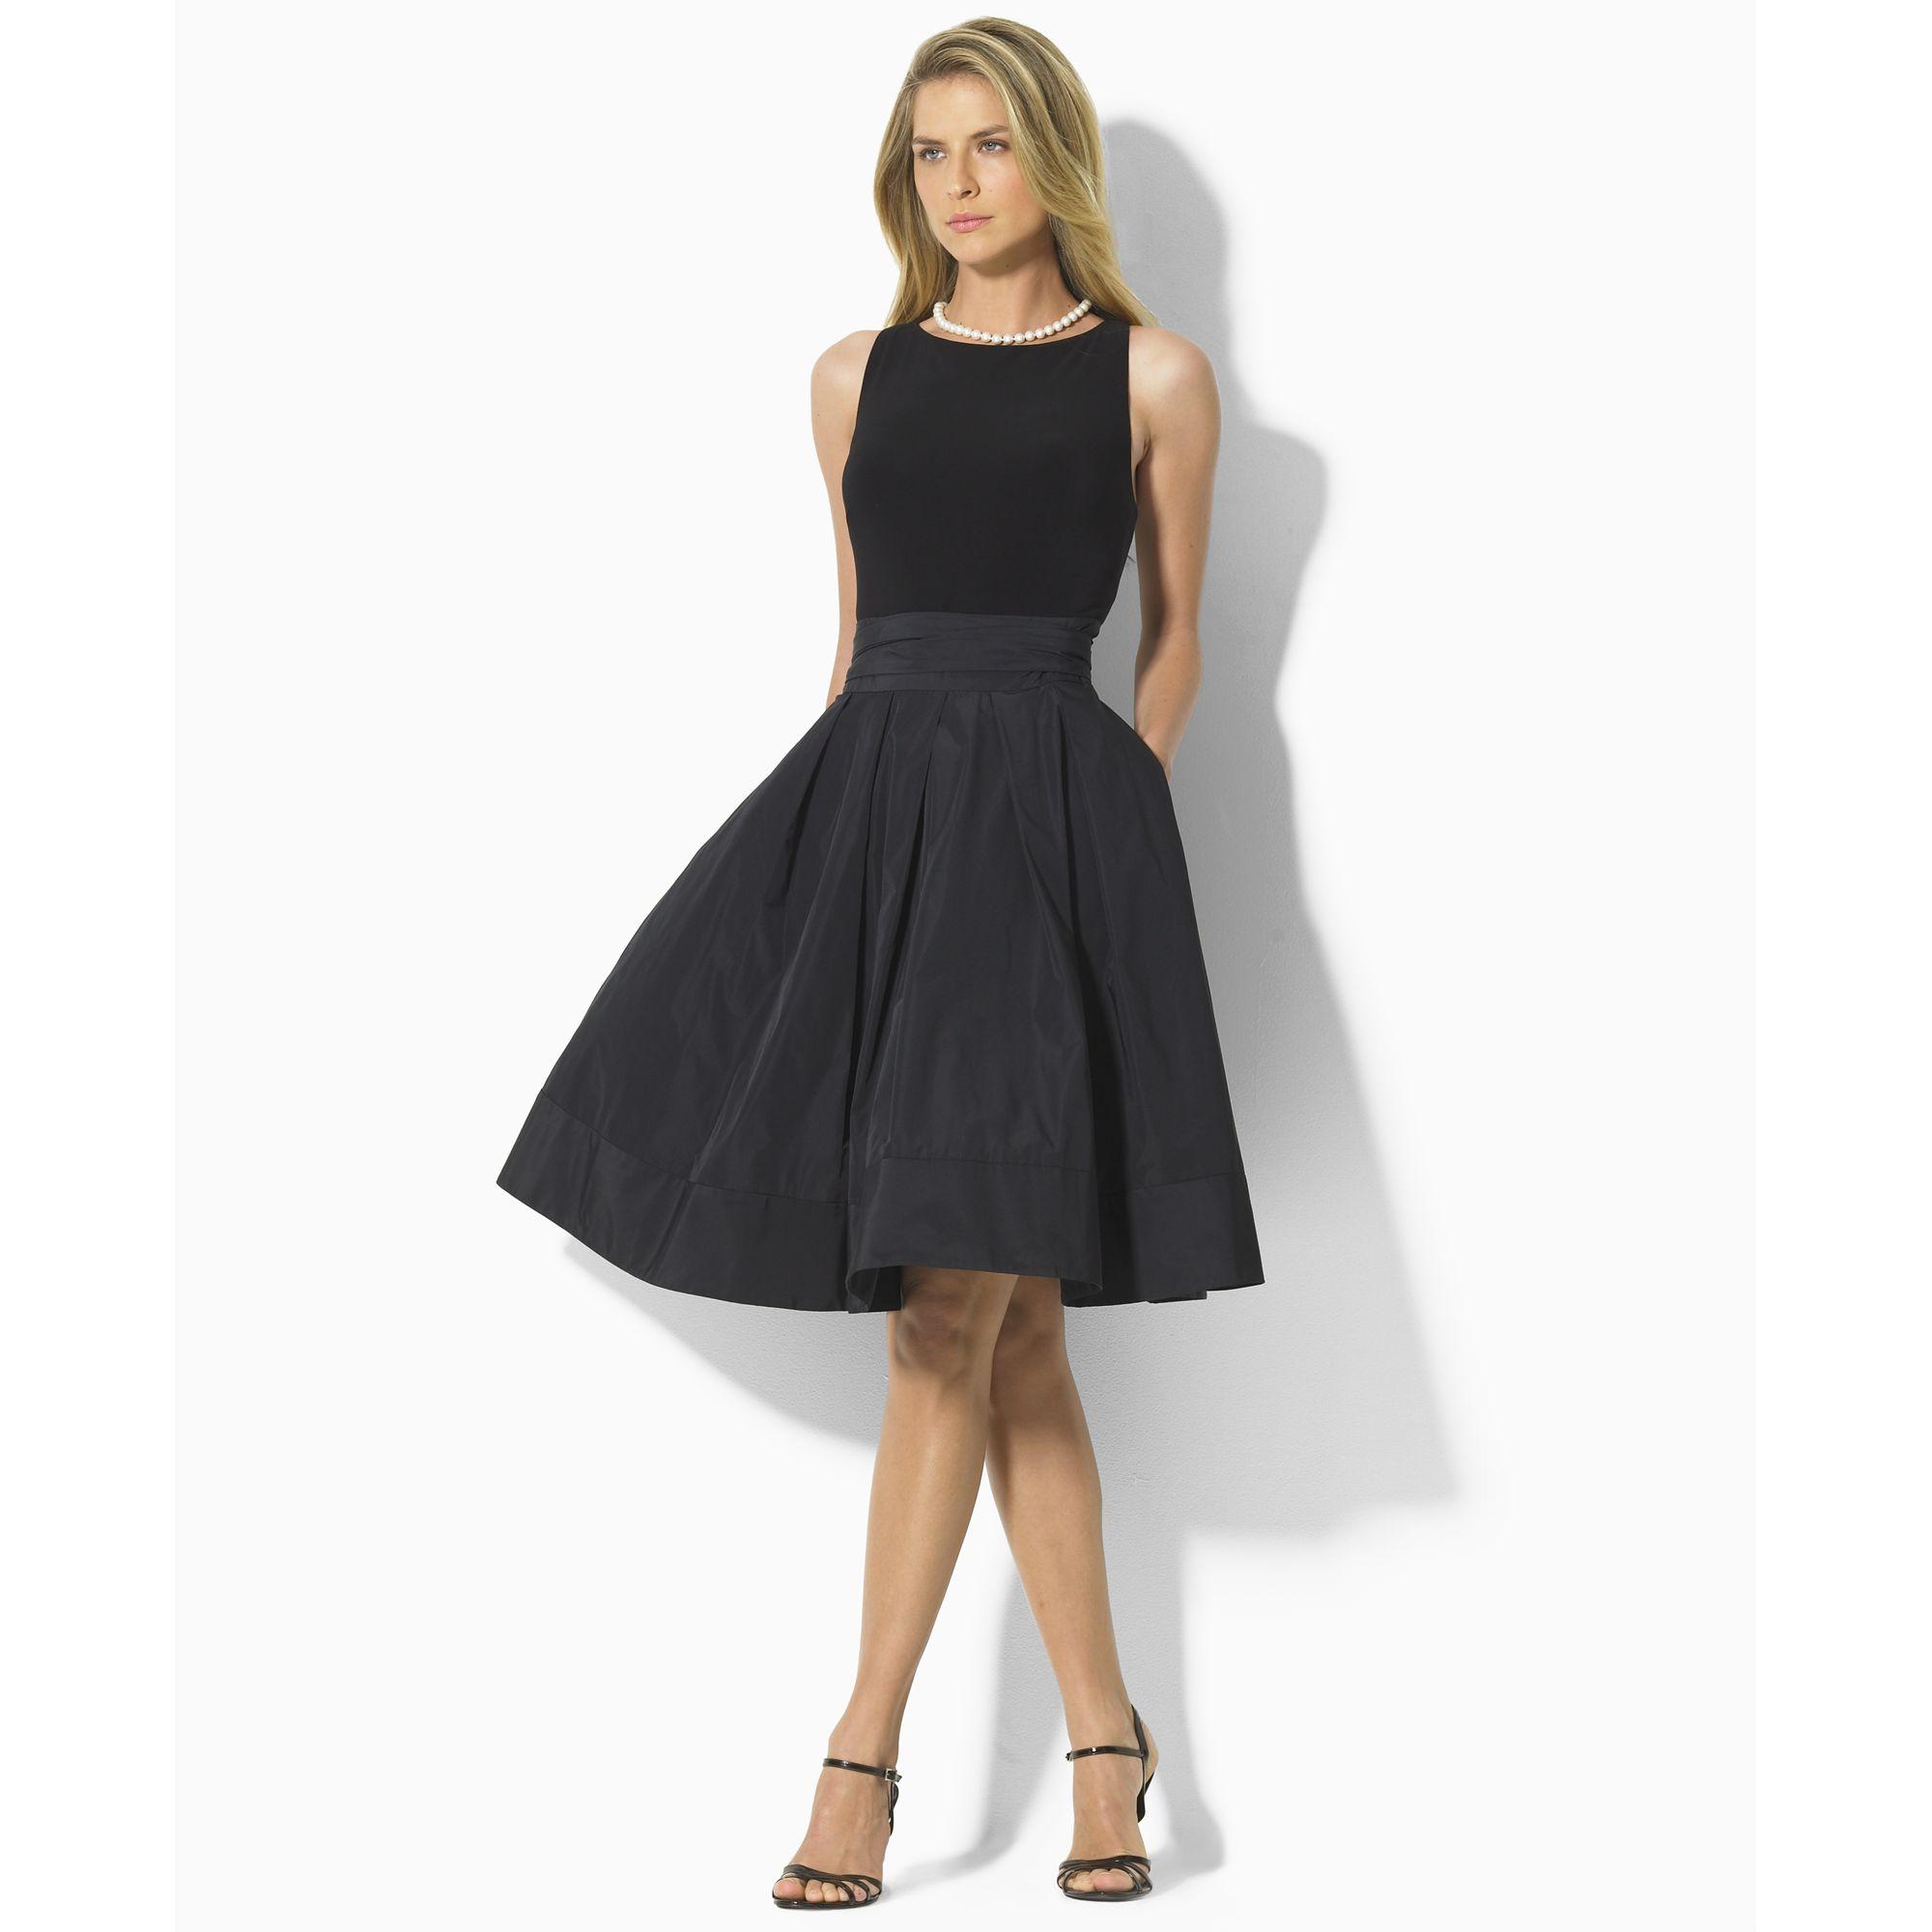 Lauren By Ralph Lauren Pleated Cocktail Dress In Black Lyst